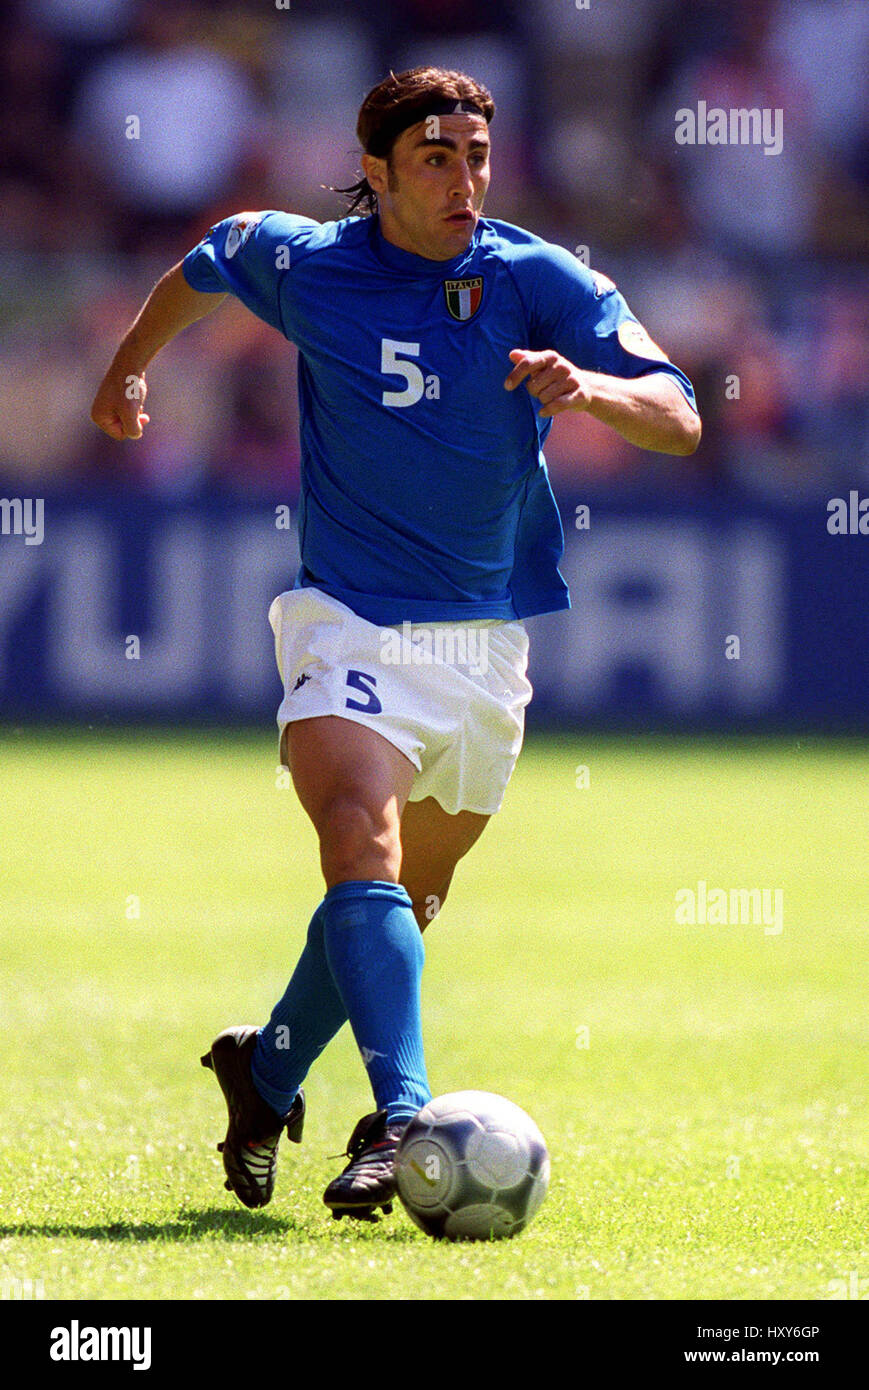 FABIO CANNAVARO ITALY & PARMA 11 June 2000 Stock Royalty